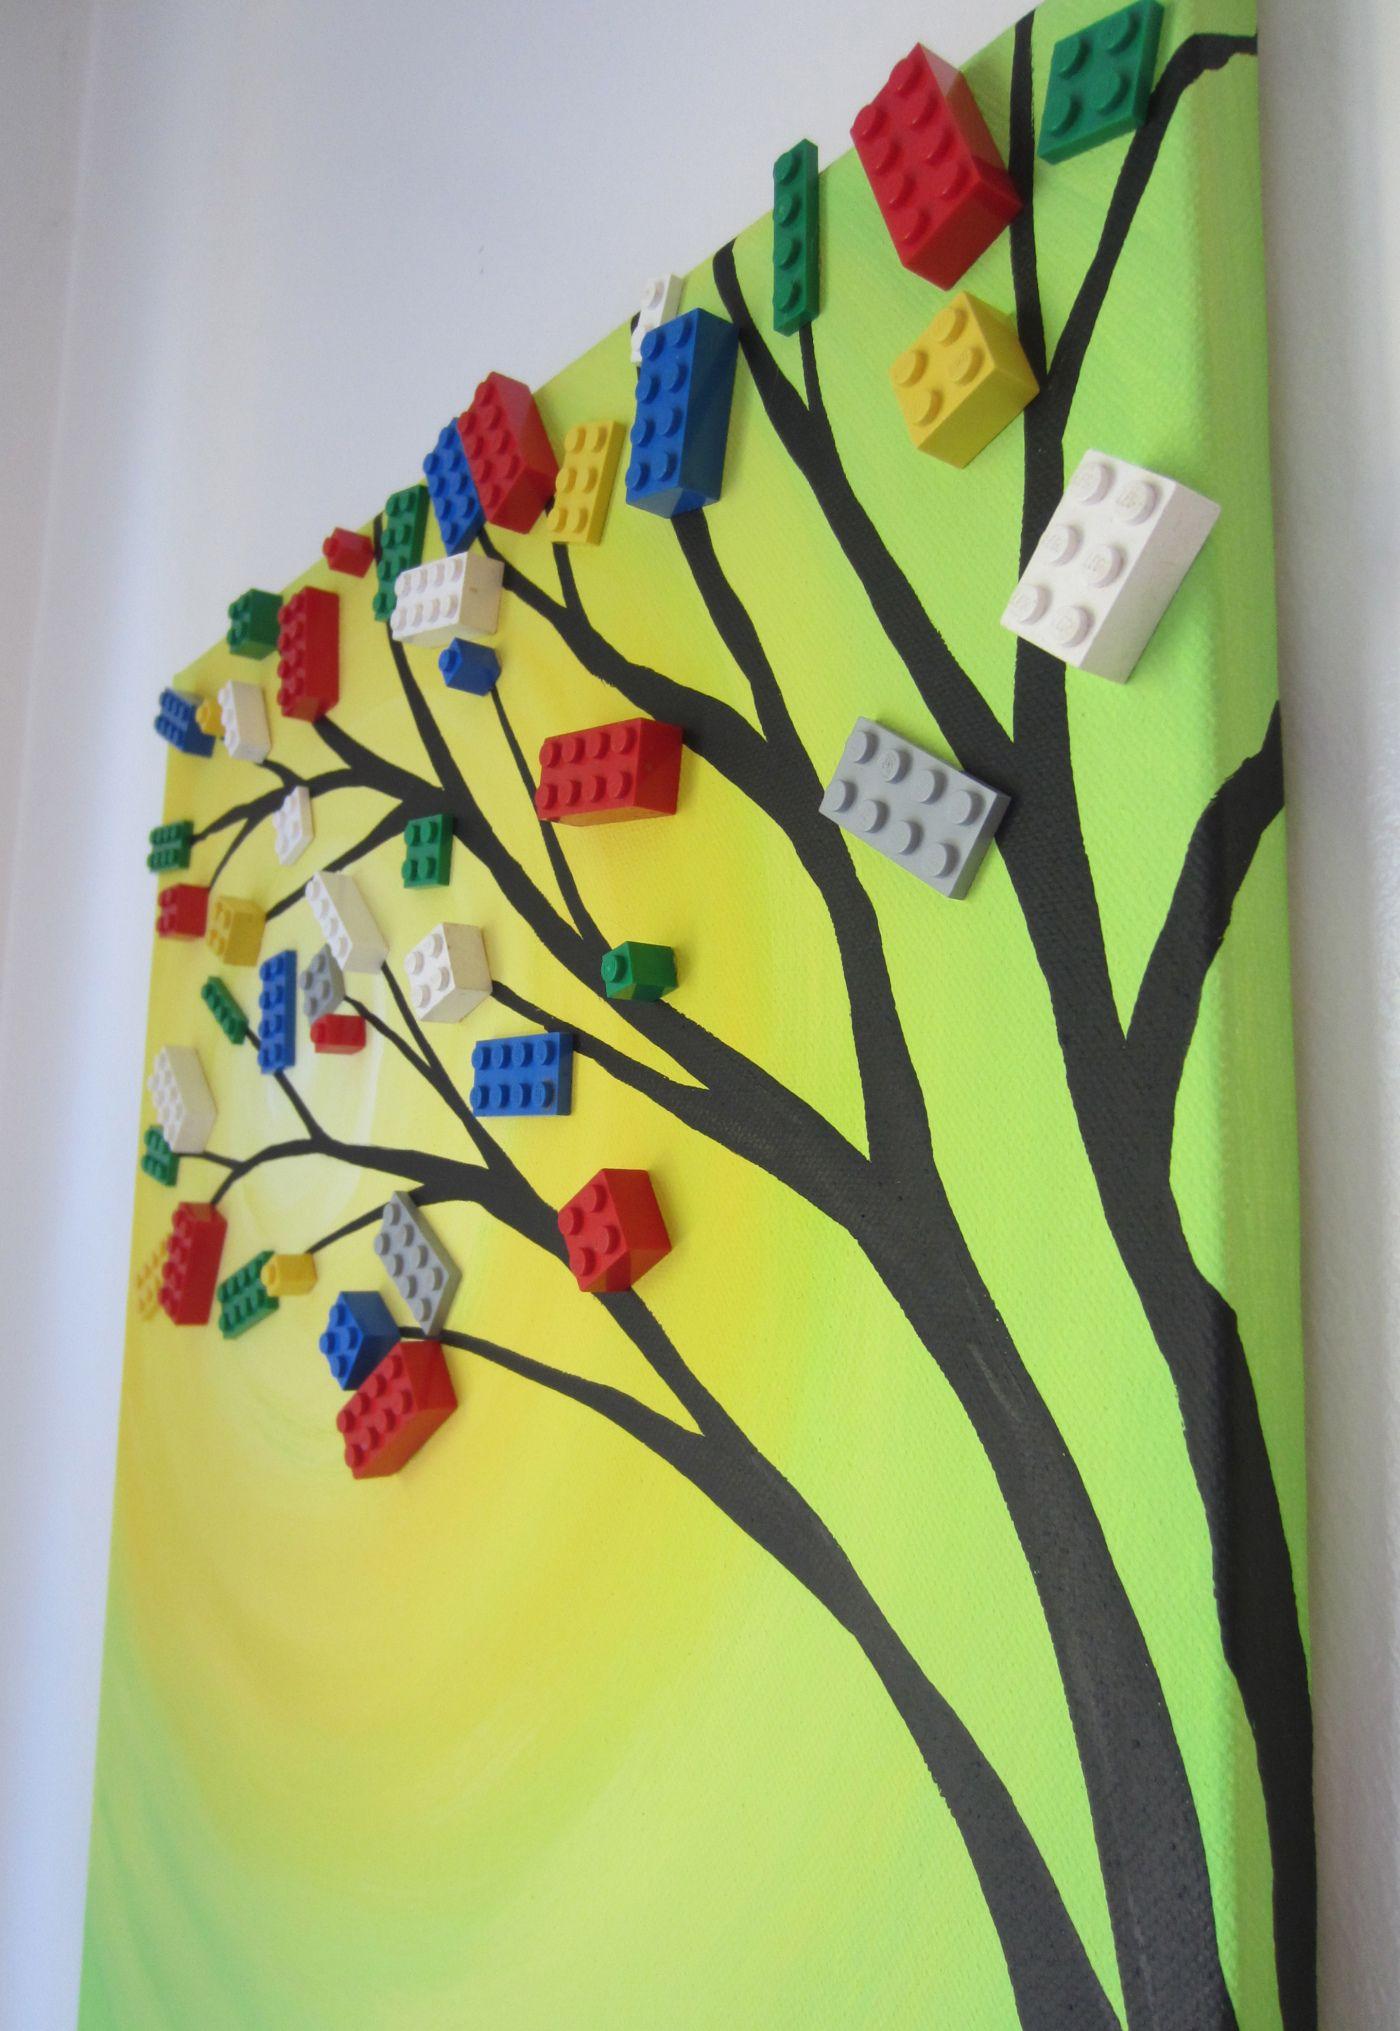 Lego Tree Canvas   DIY Projects & Crafts   Pinterest   Tree canvas ...